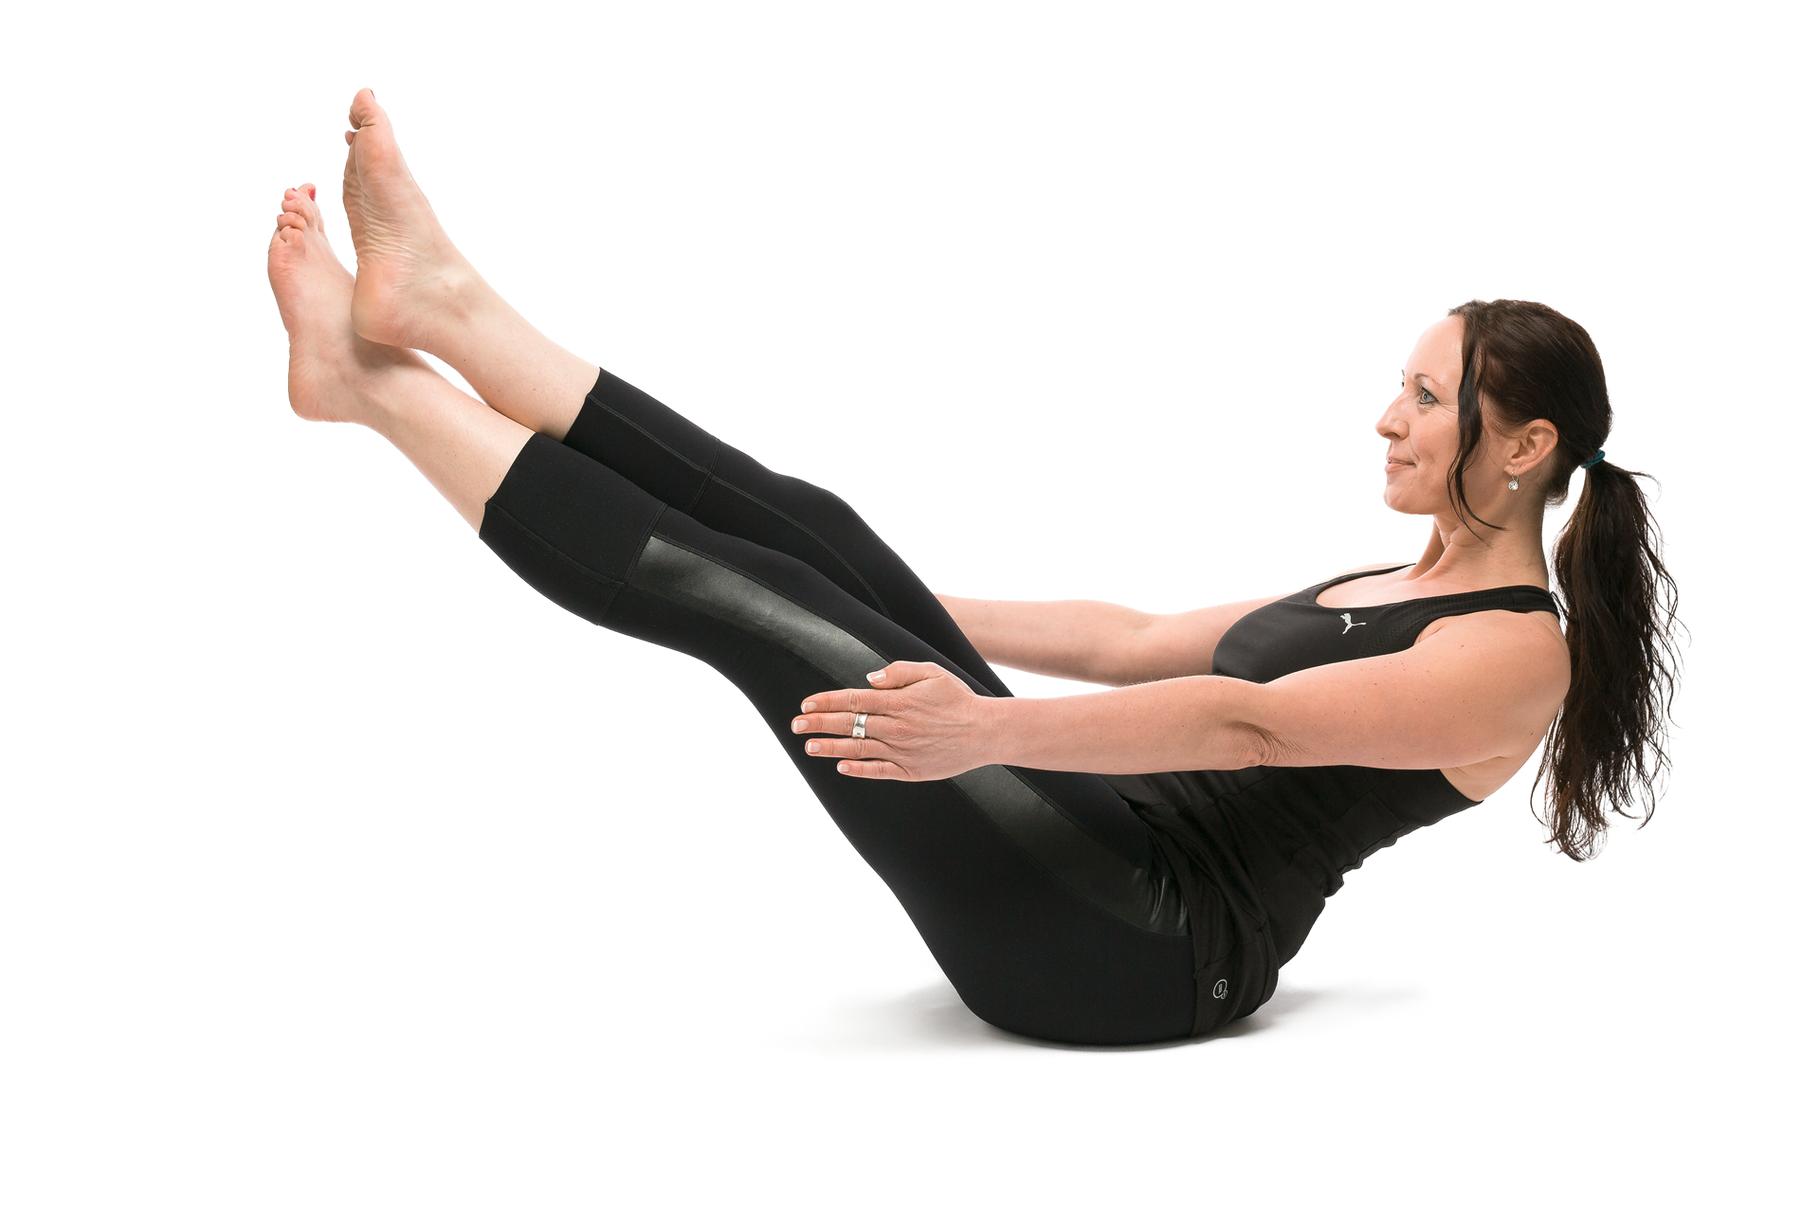 Pilates - Kräftigung der Rumpfmuskulatur